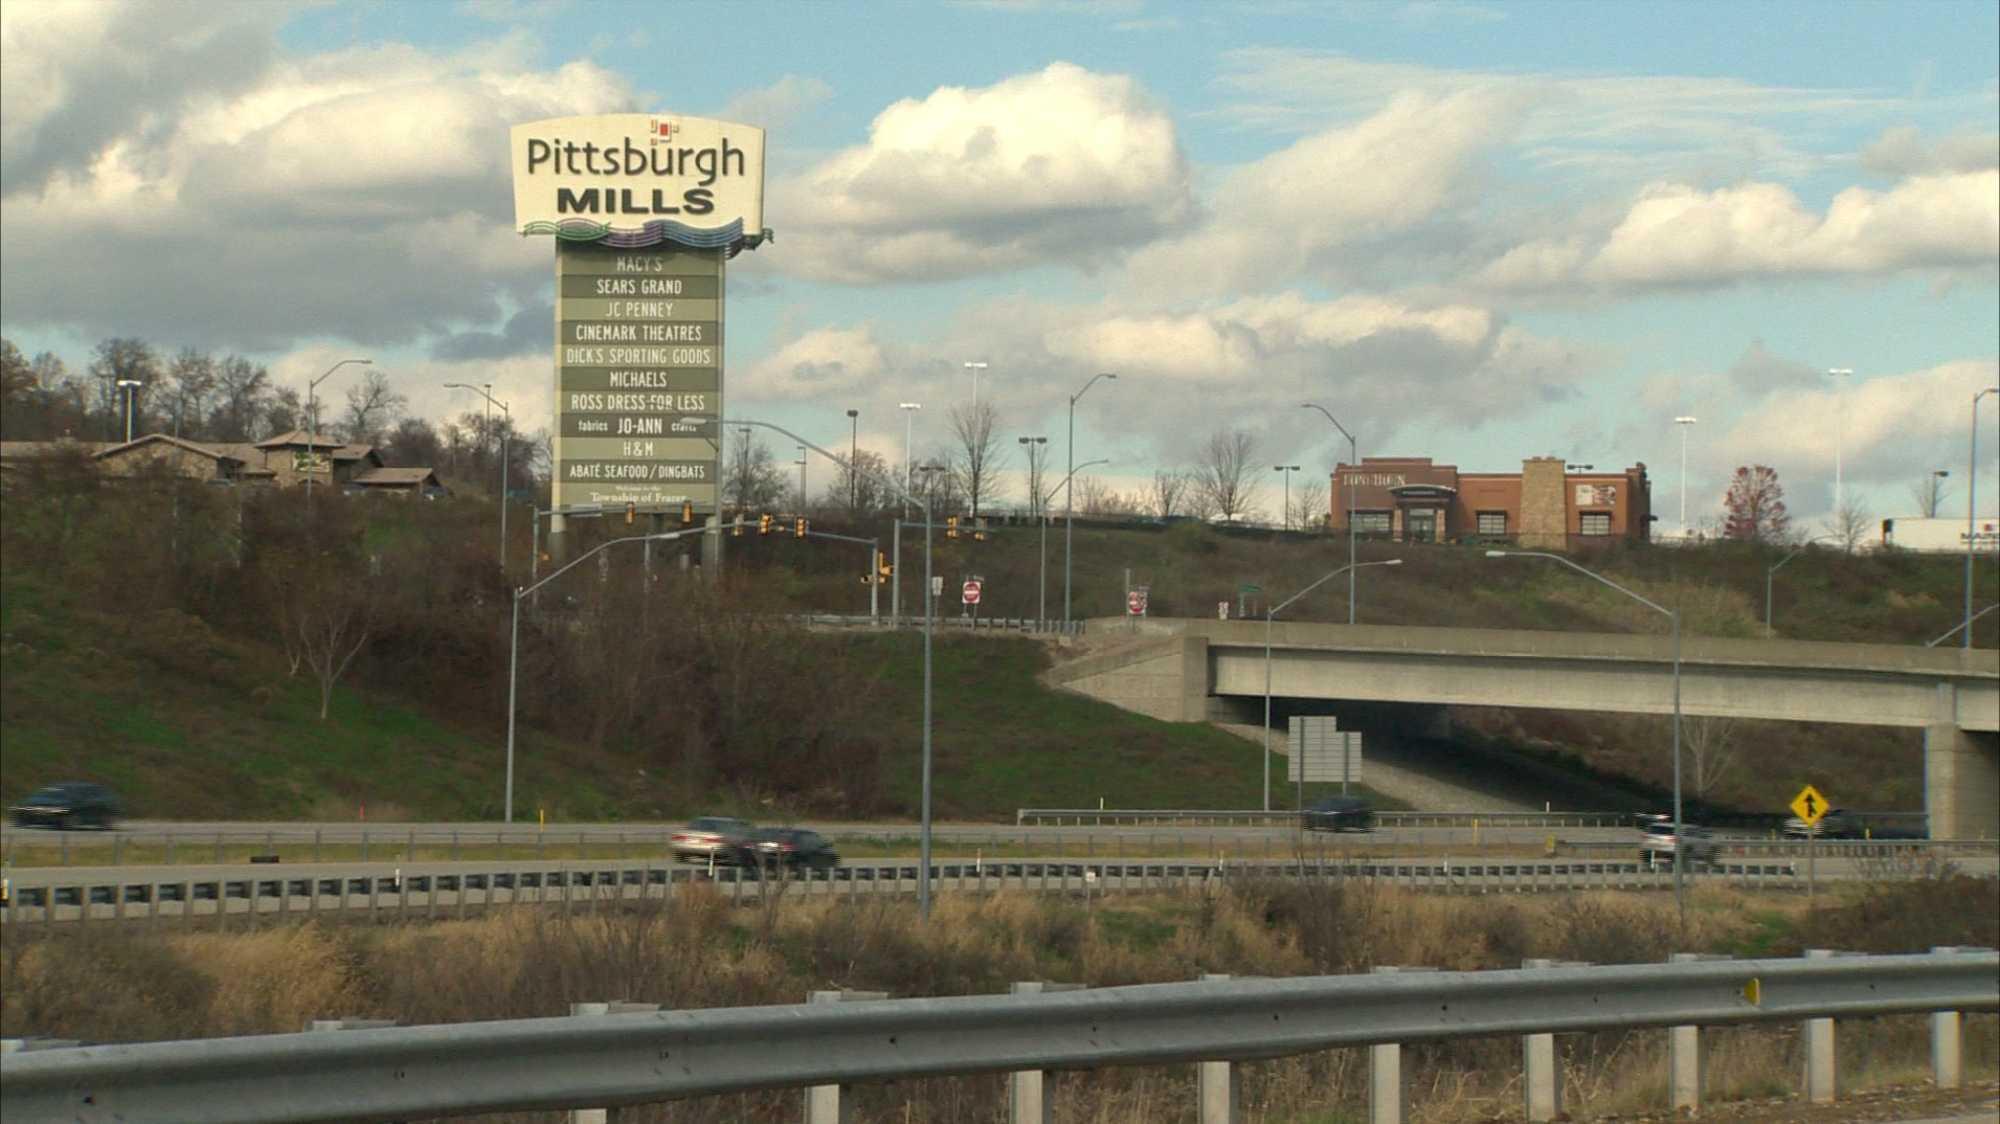 Pittsburgh Mills